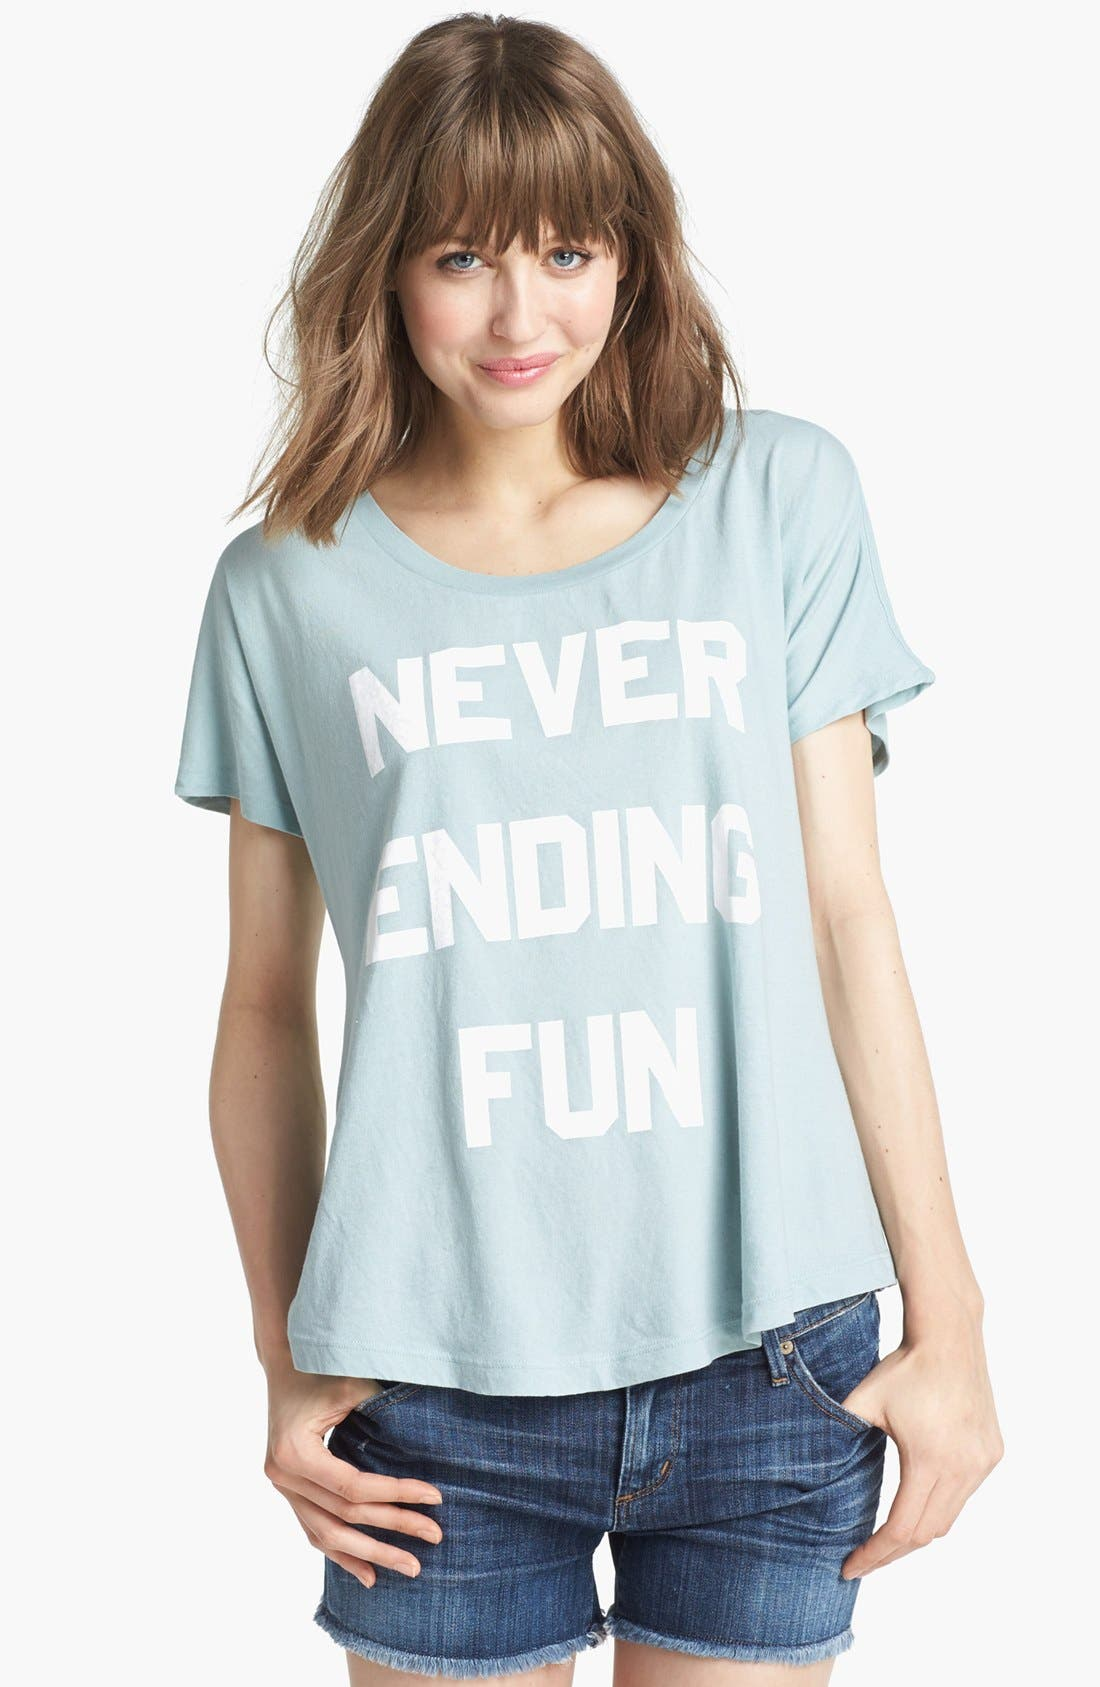 Alternate Image 1 Selected - Wildfox 'Never Ending Fun' Tee